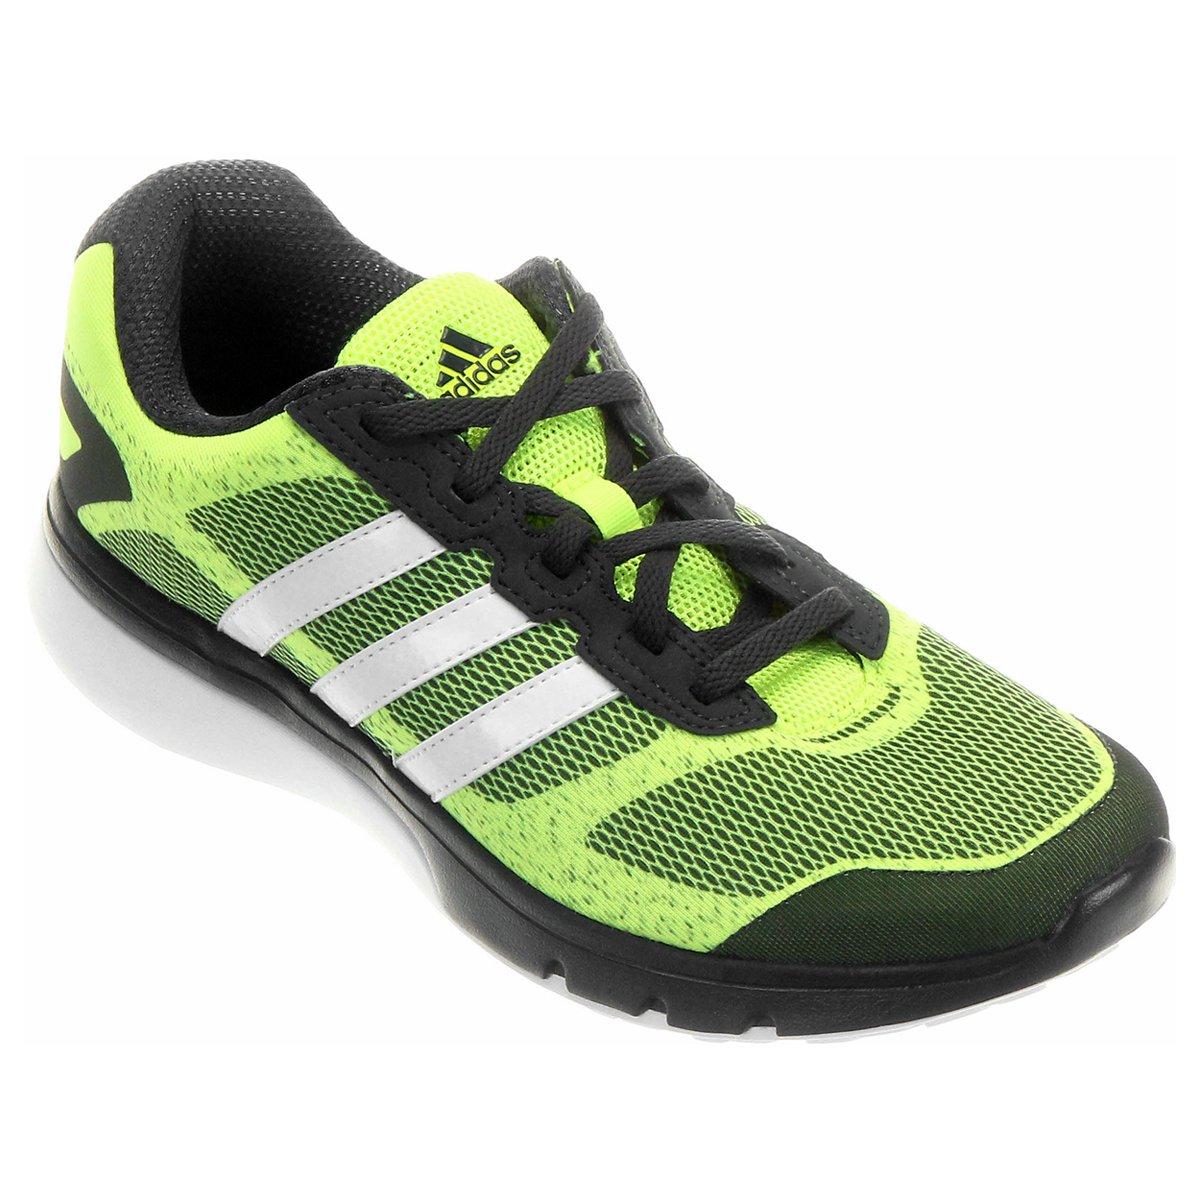 b620f6af926 Tênis Adidas Turbo Masculino - Compre Agora